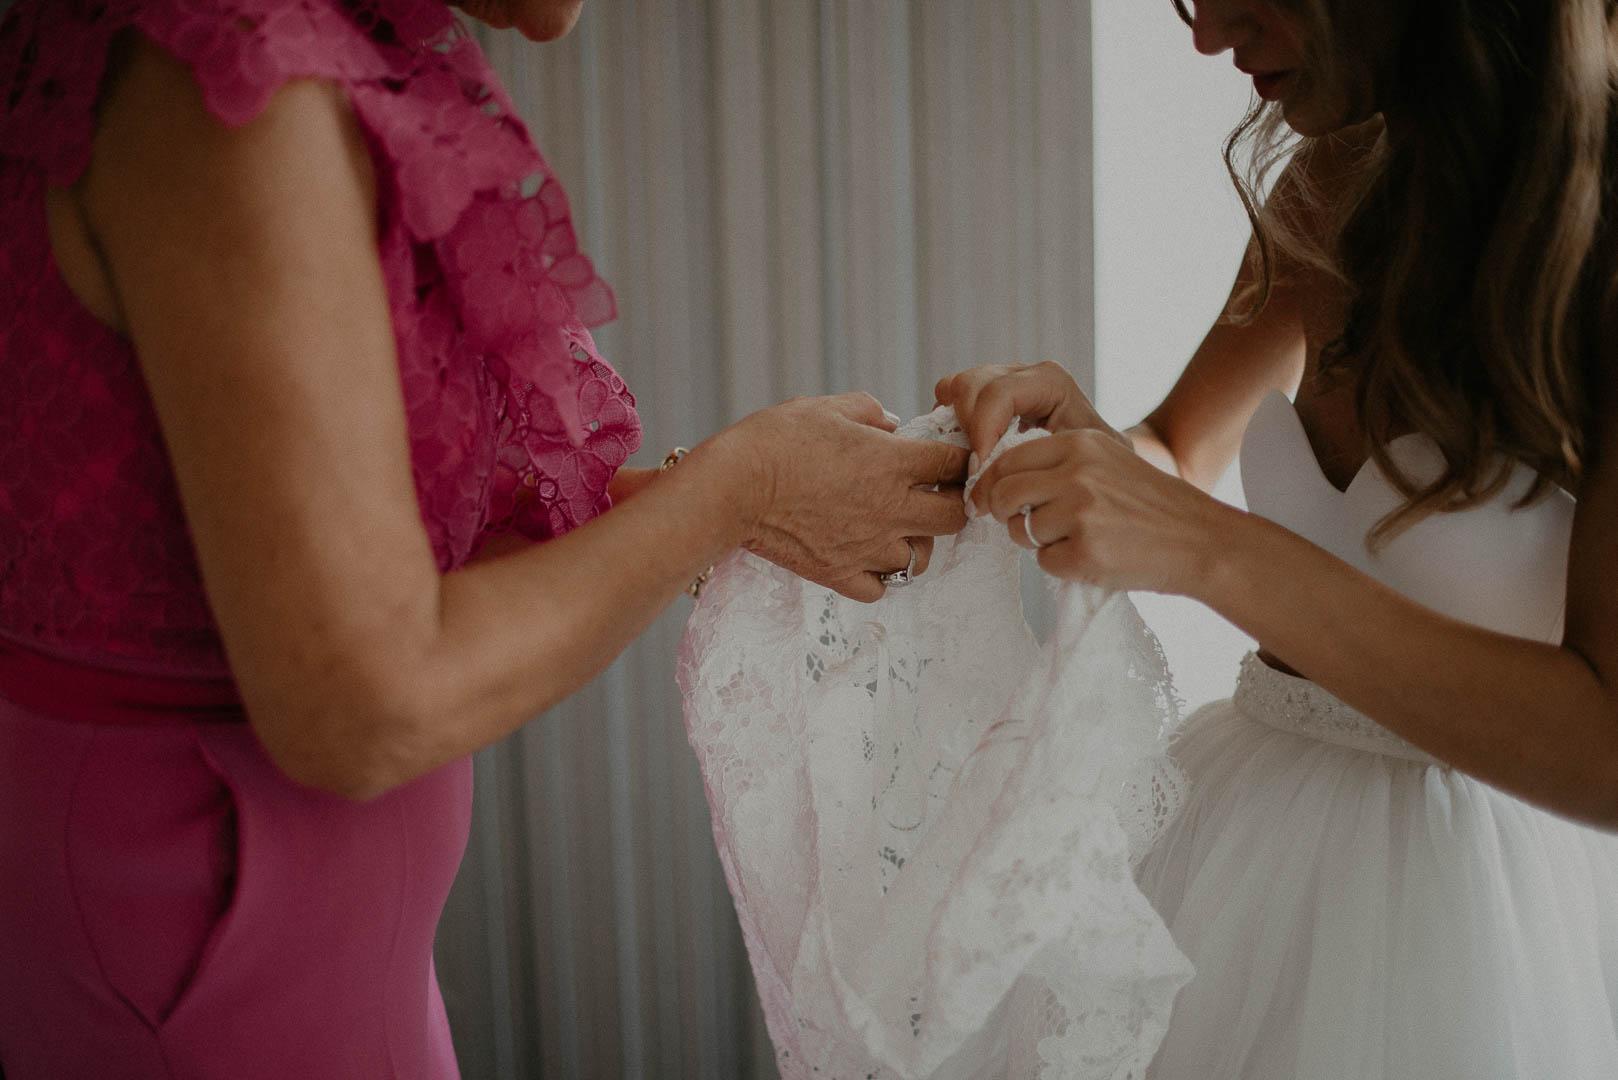 wedding-photographer-destination-fineart-bespoke-reportage-napoli-nabilah-vivianeizzo-spazio46-39